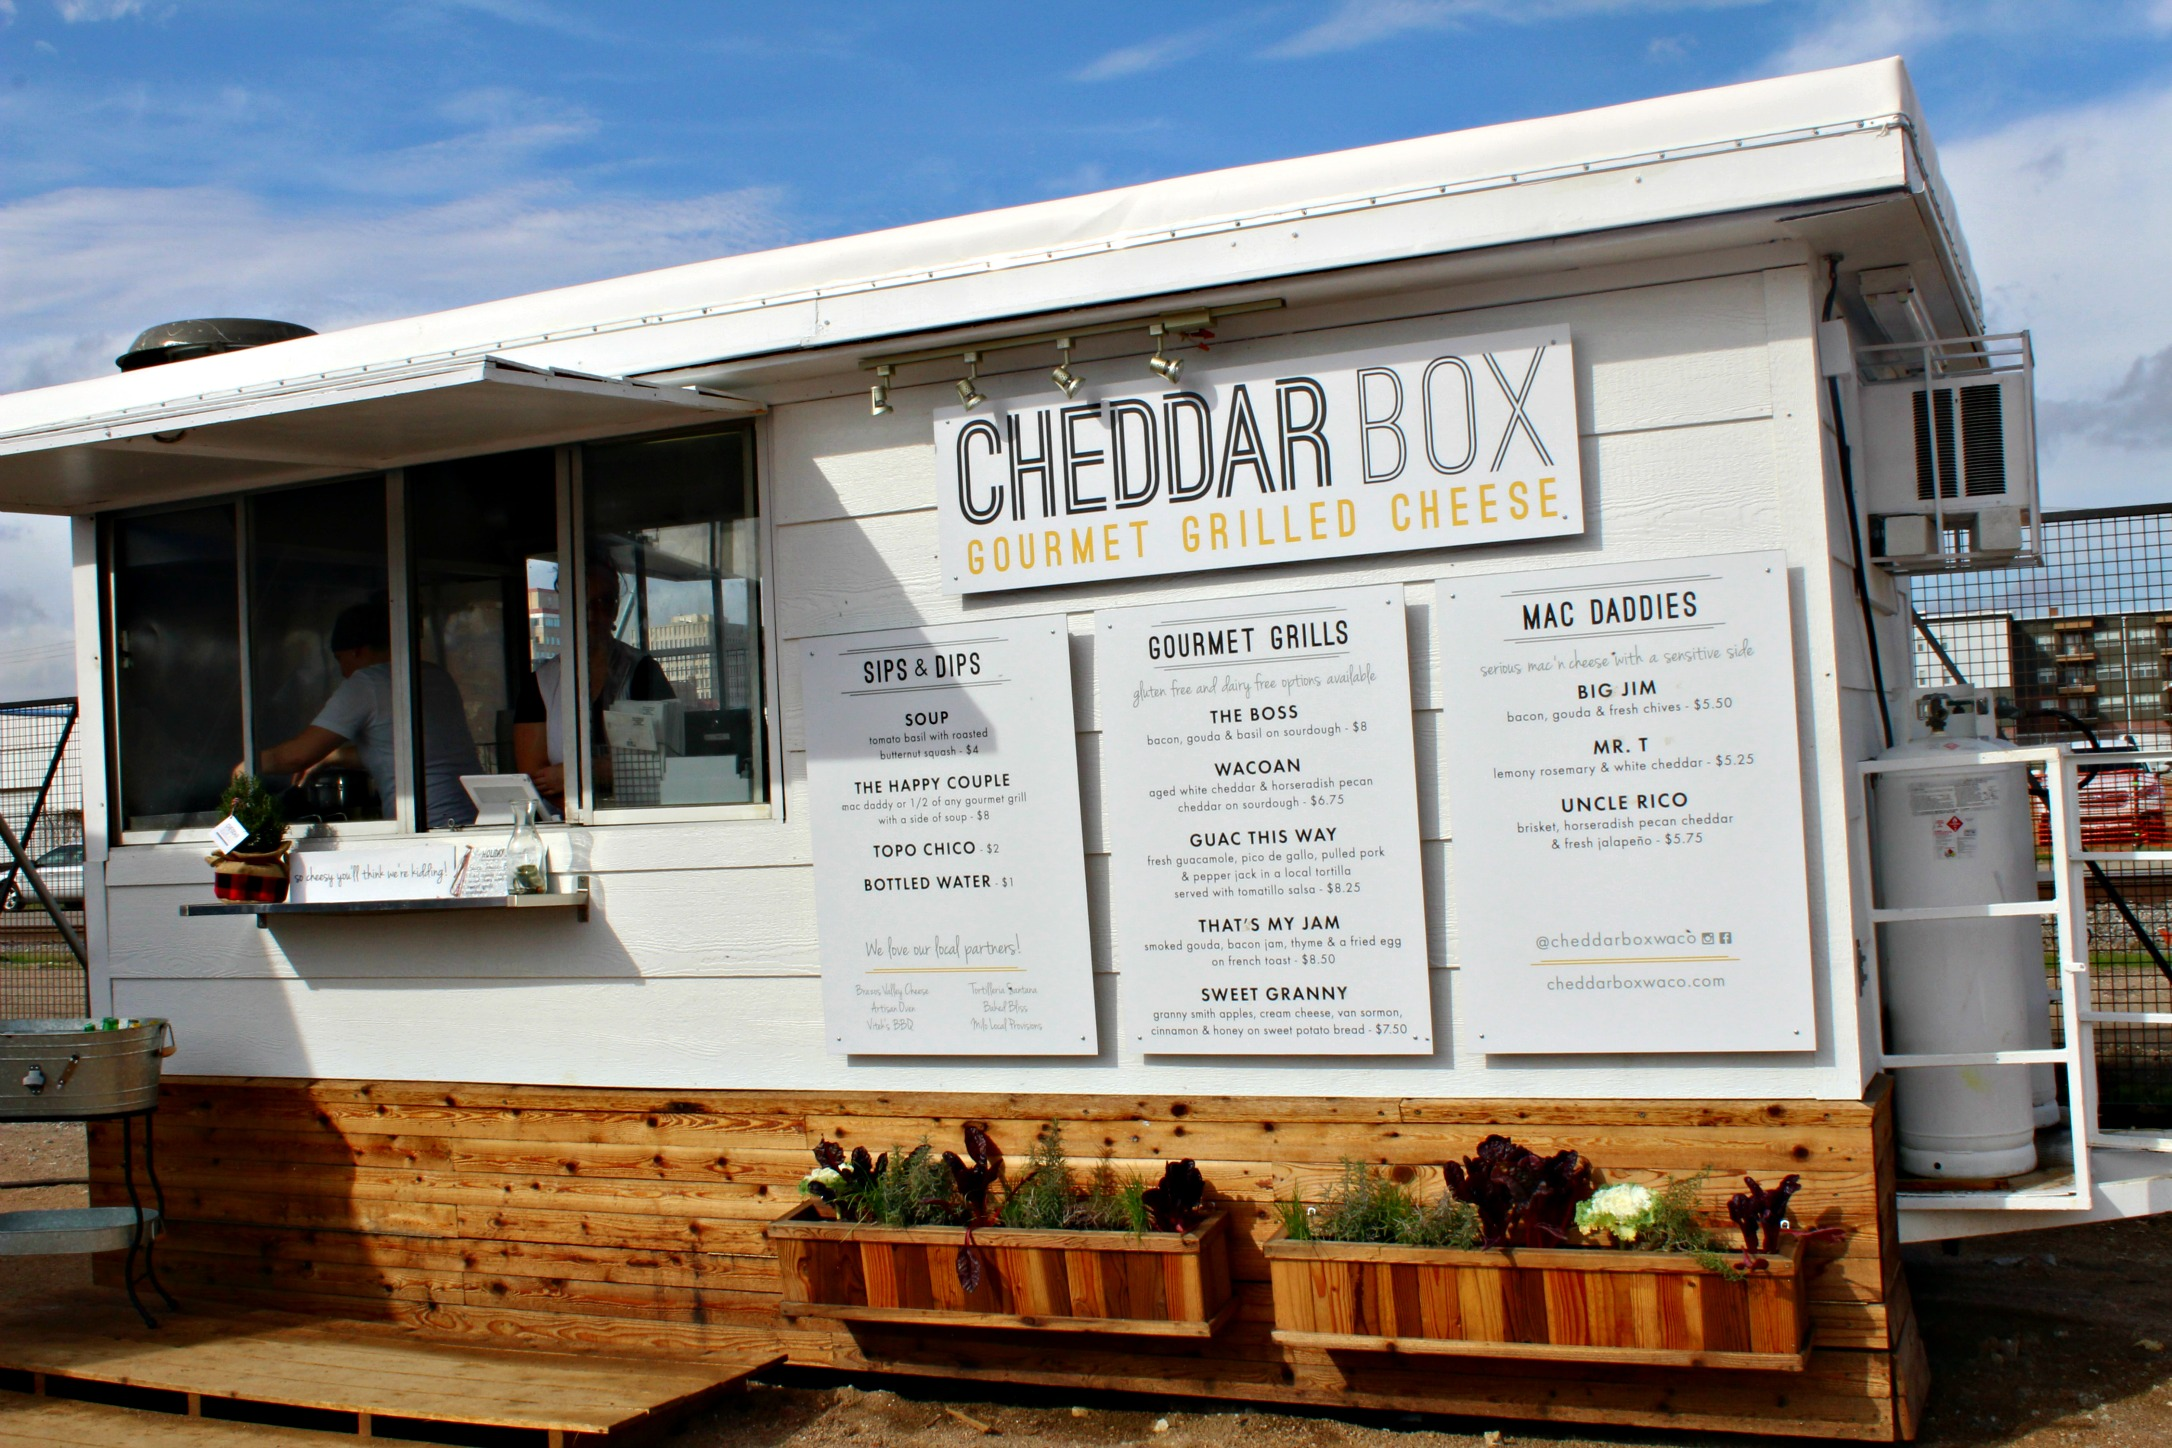 Magnolia Market Cheddar Box Food Truck